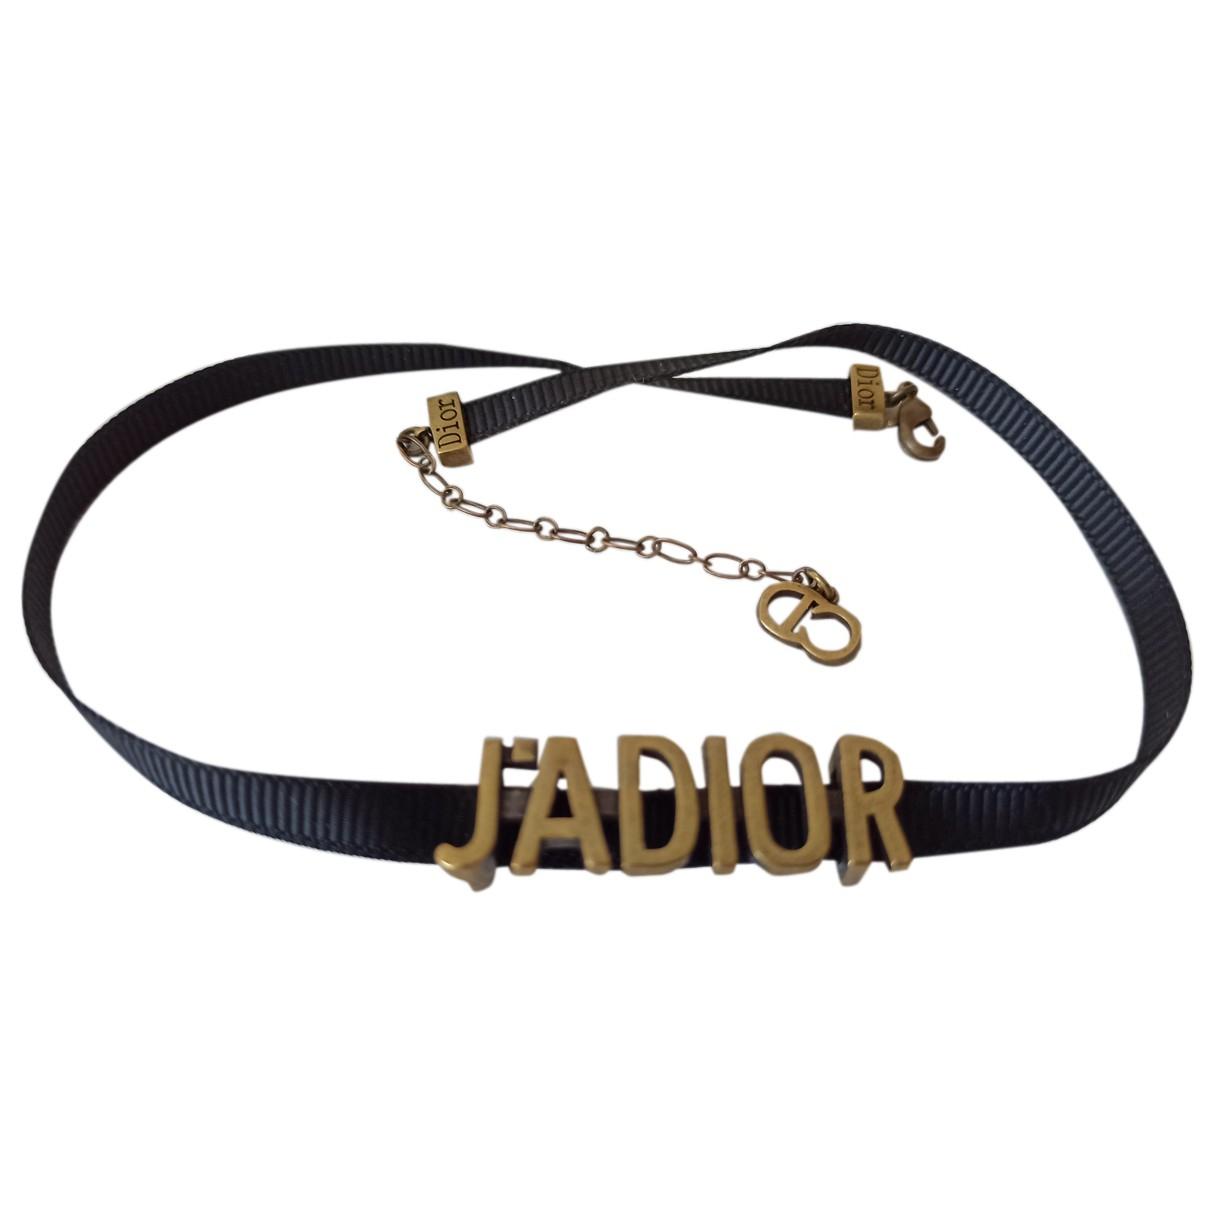 Collar Jadior Dior